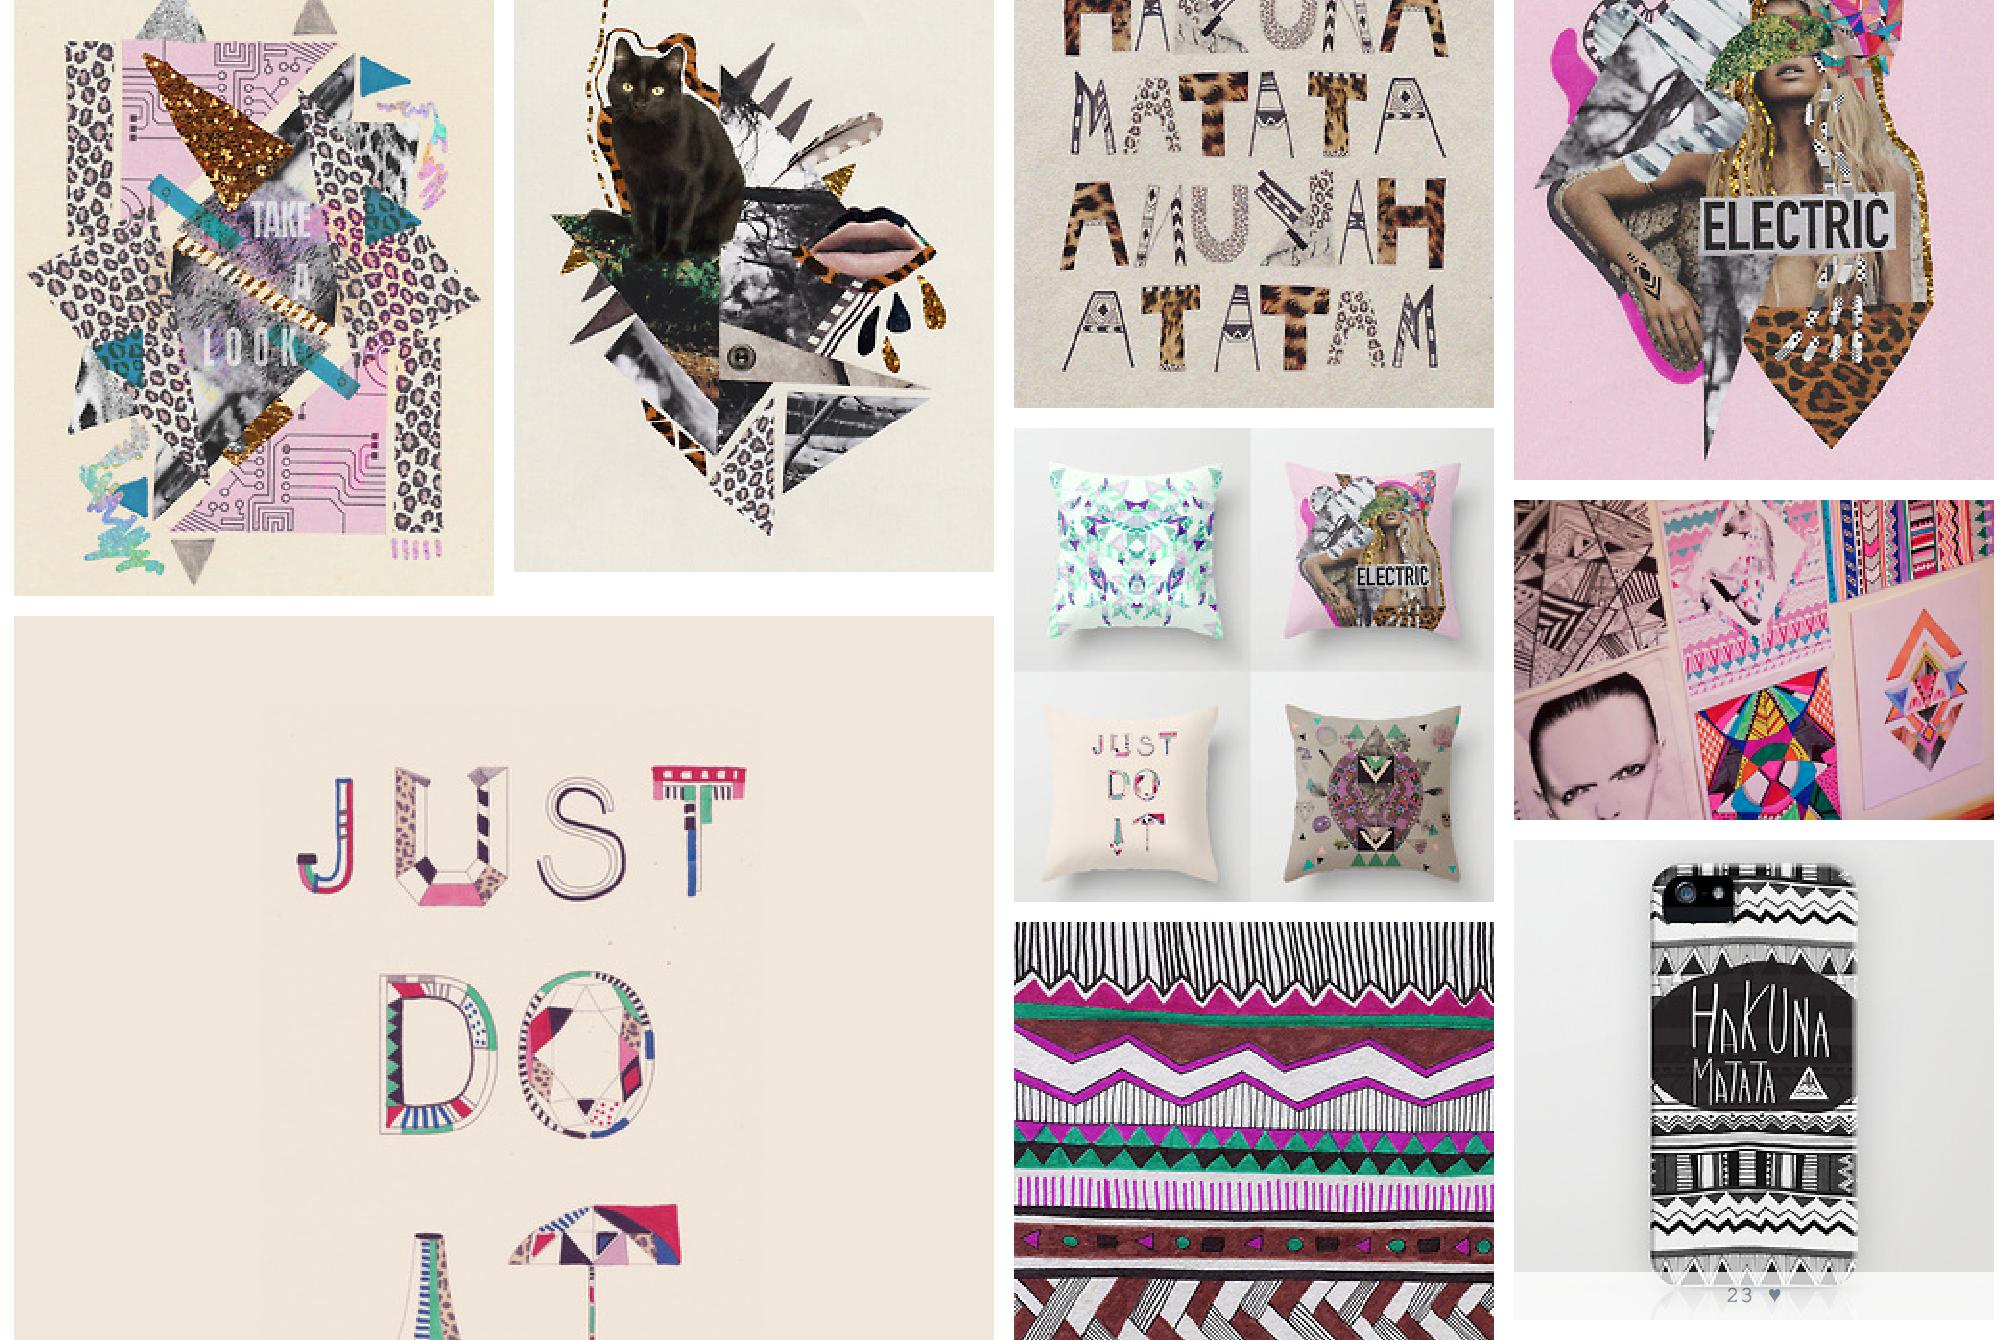 My Tumblr Art Design Illustrations Vasare Nar Art Fashion Design Blog